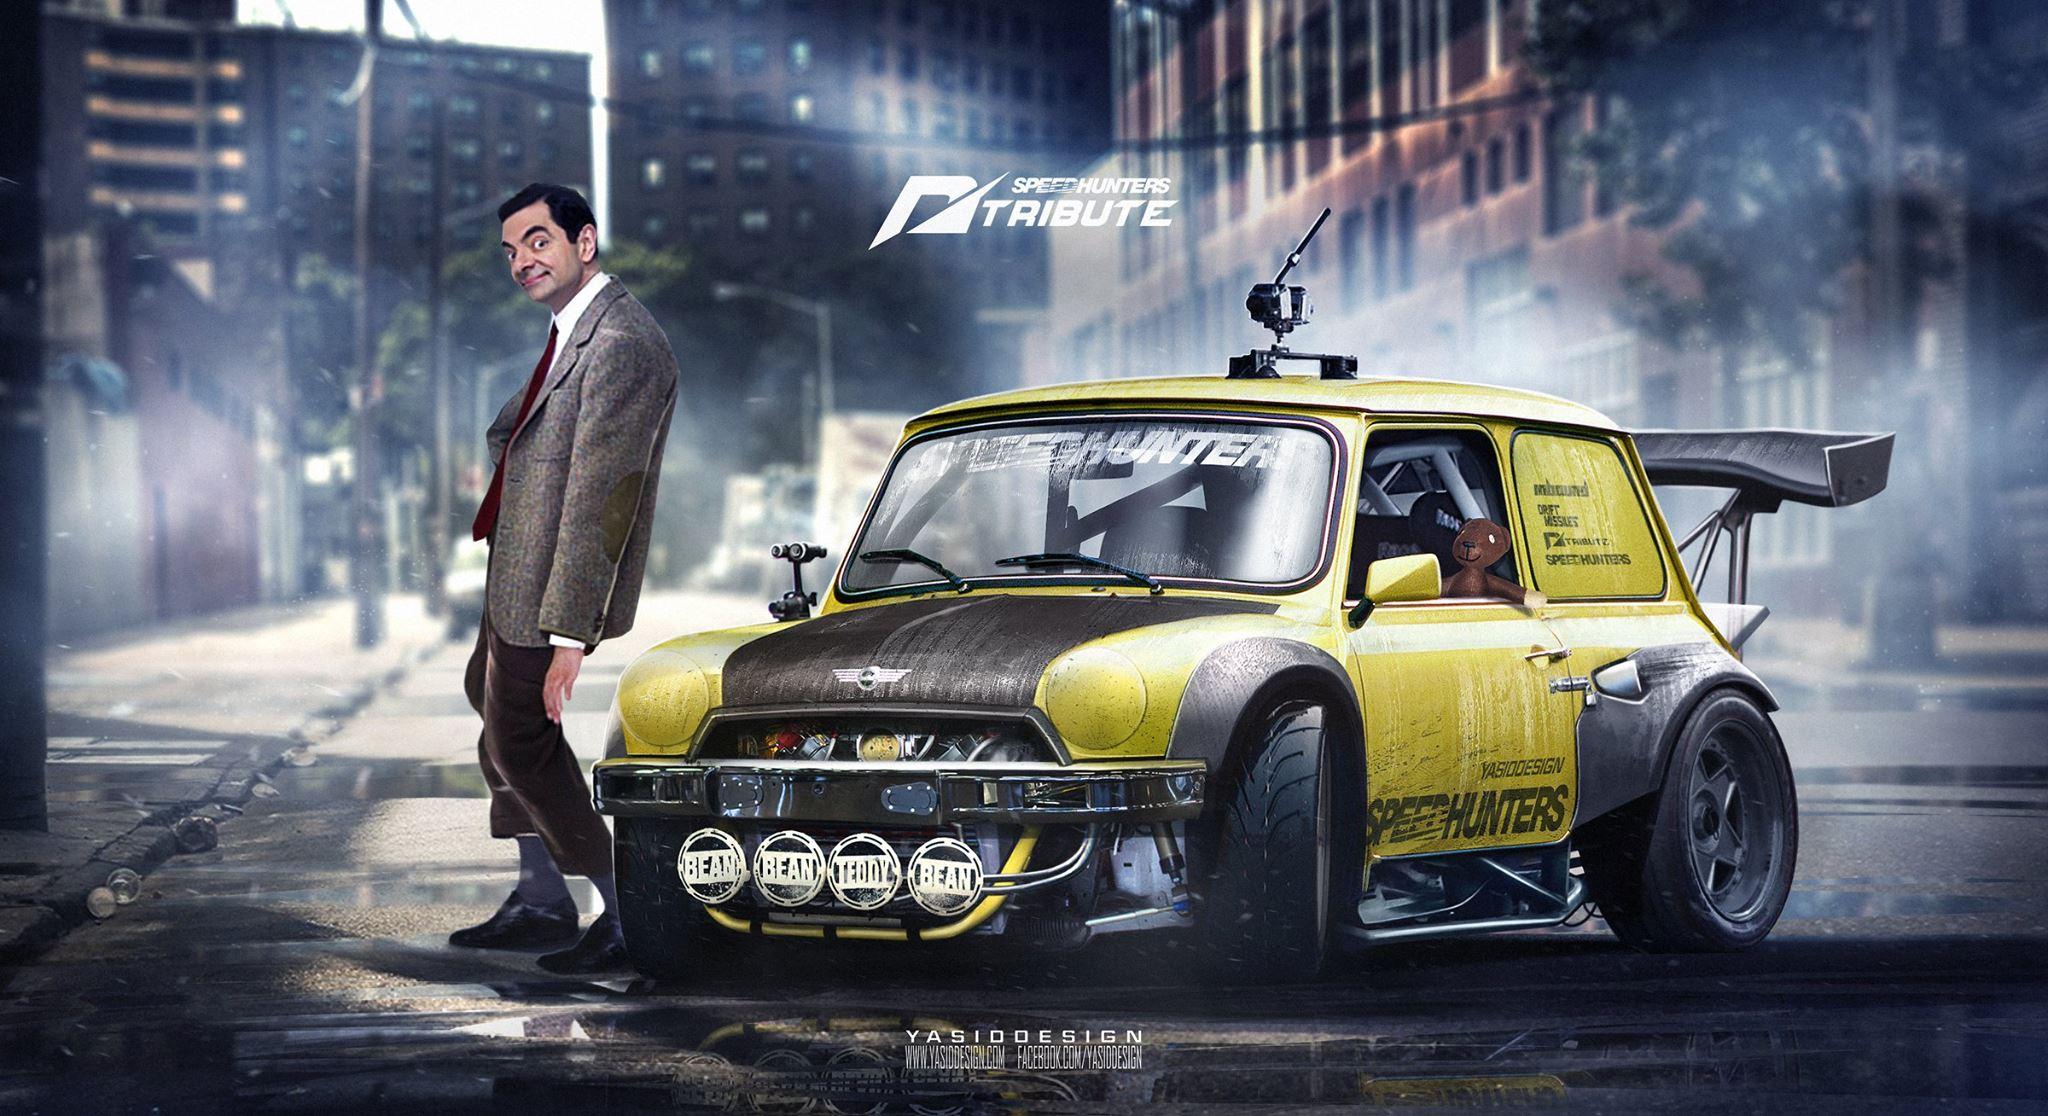 Mr Bean Mini Race Car Nfs Theme Has Huge Spoiler